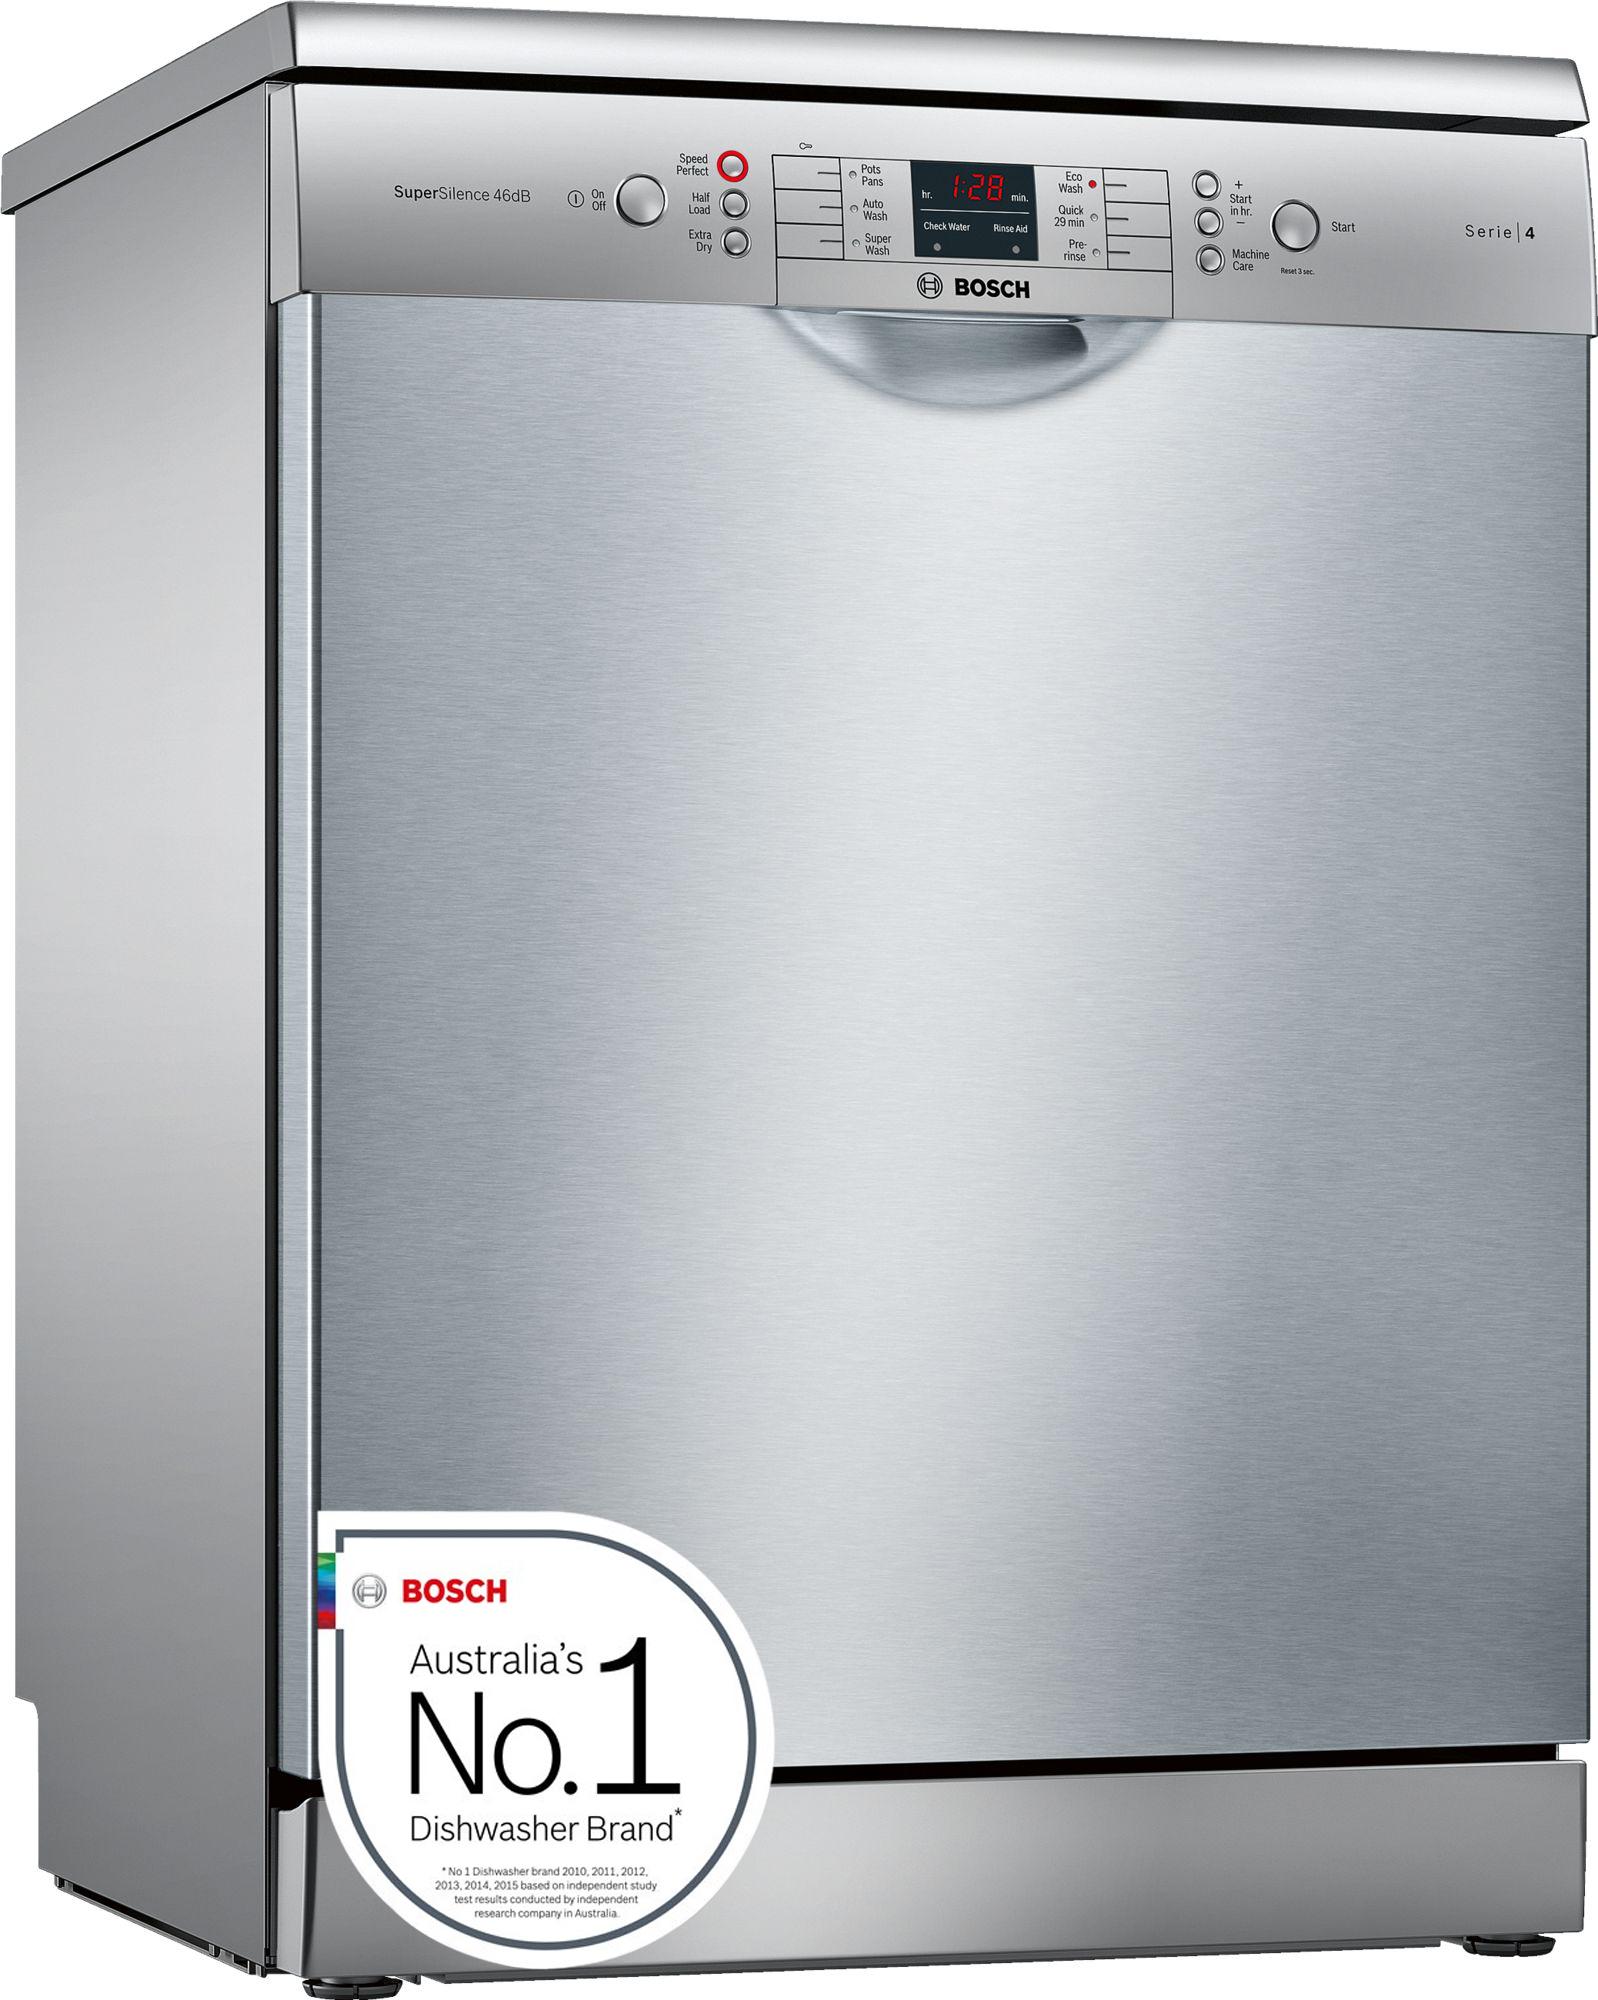 bosch 60cm series 4 freestanding dishwasher sms46gi01a aud picclick au. Black Bedroom Furniture Sets. Home Design Ideas